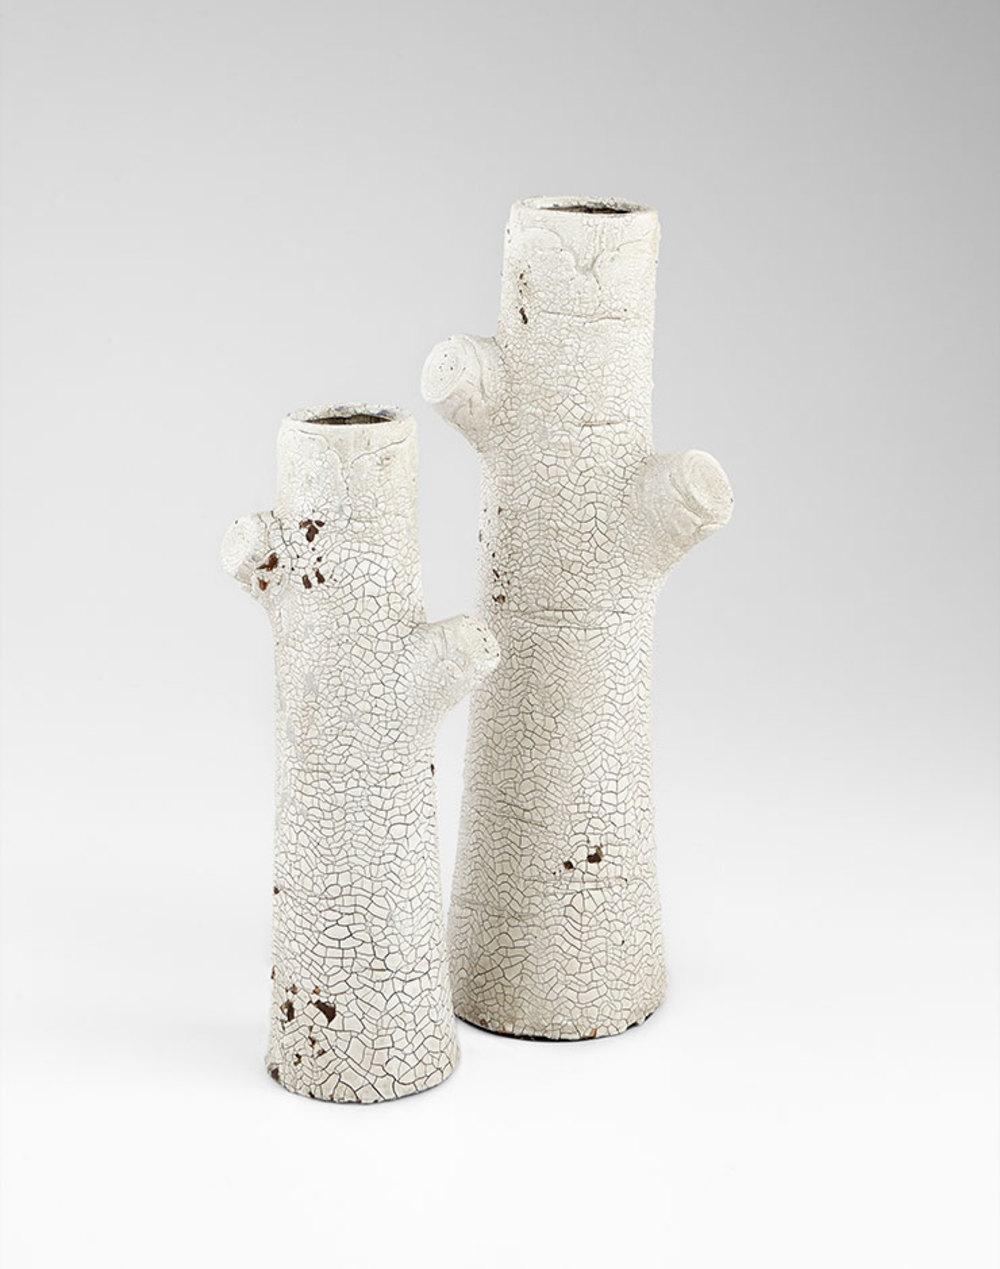 Cyan Designs - Large Branch Out Vase